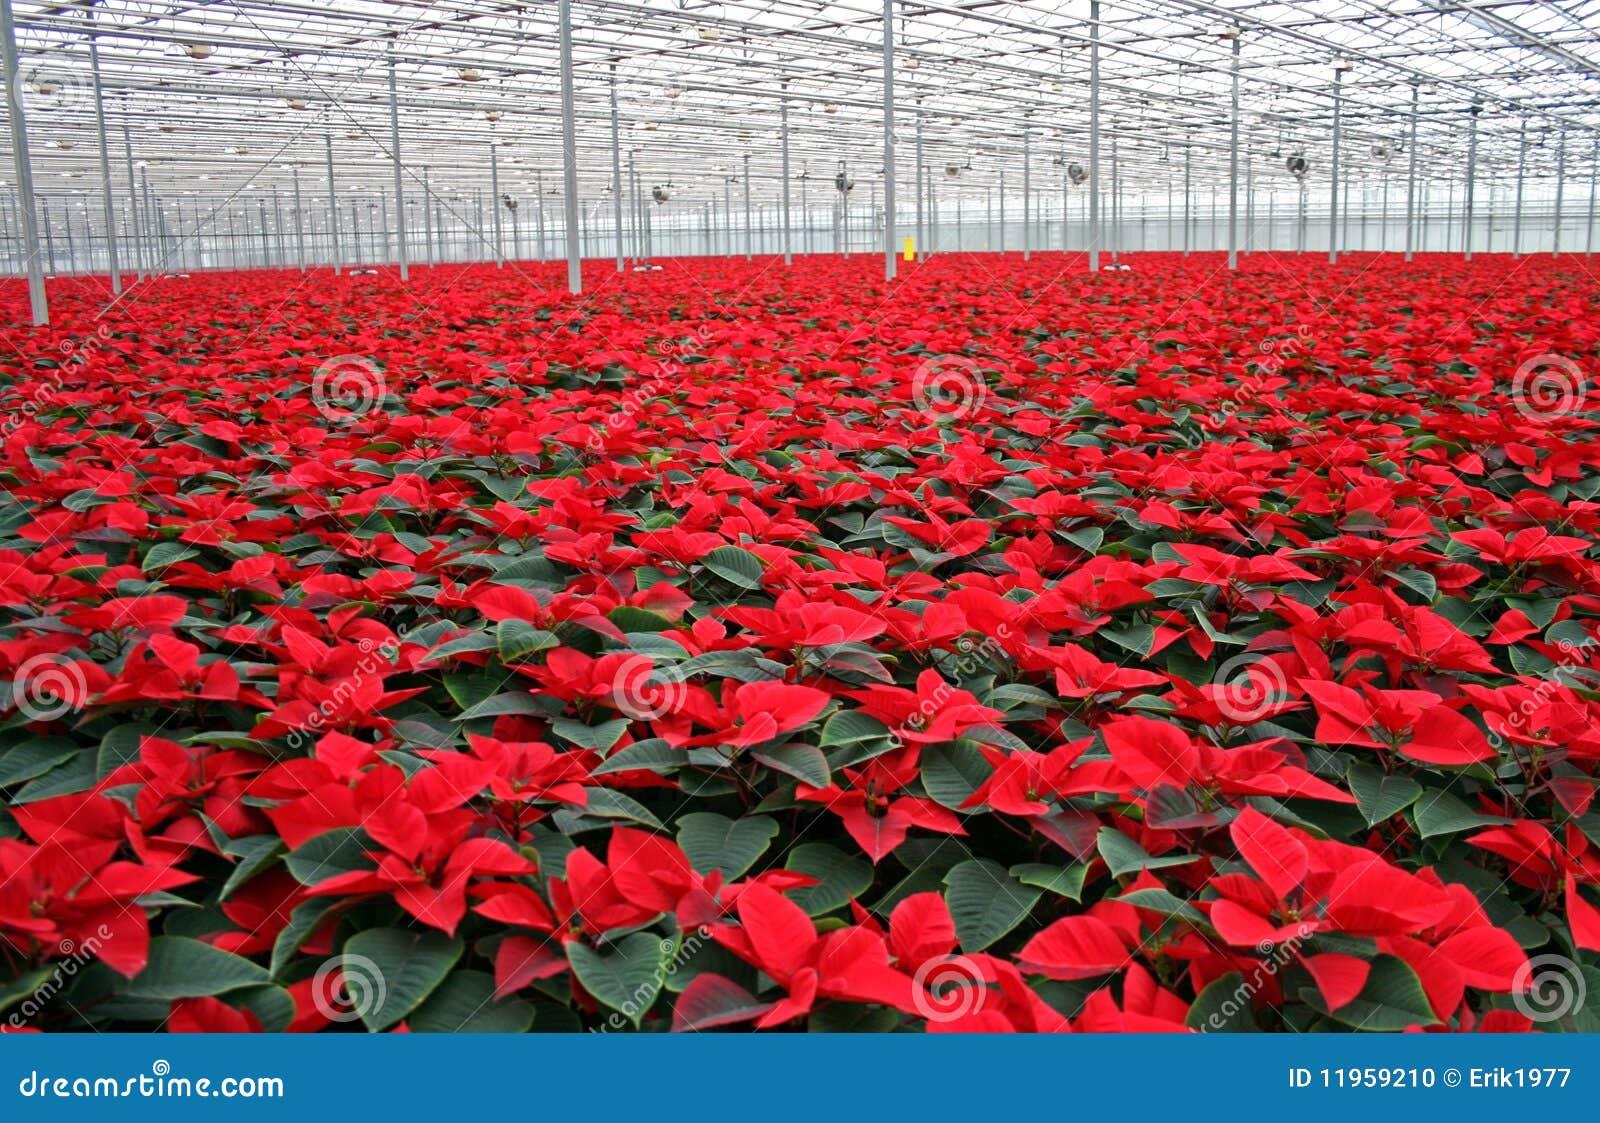 Poinsettia in greenhouse